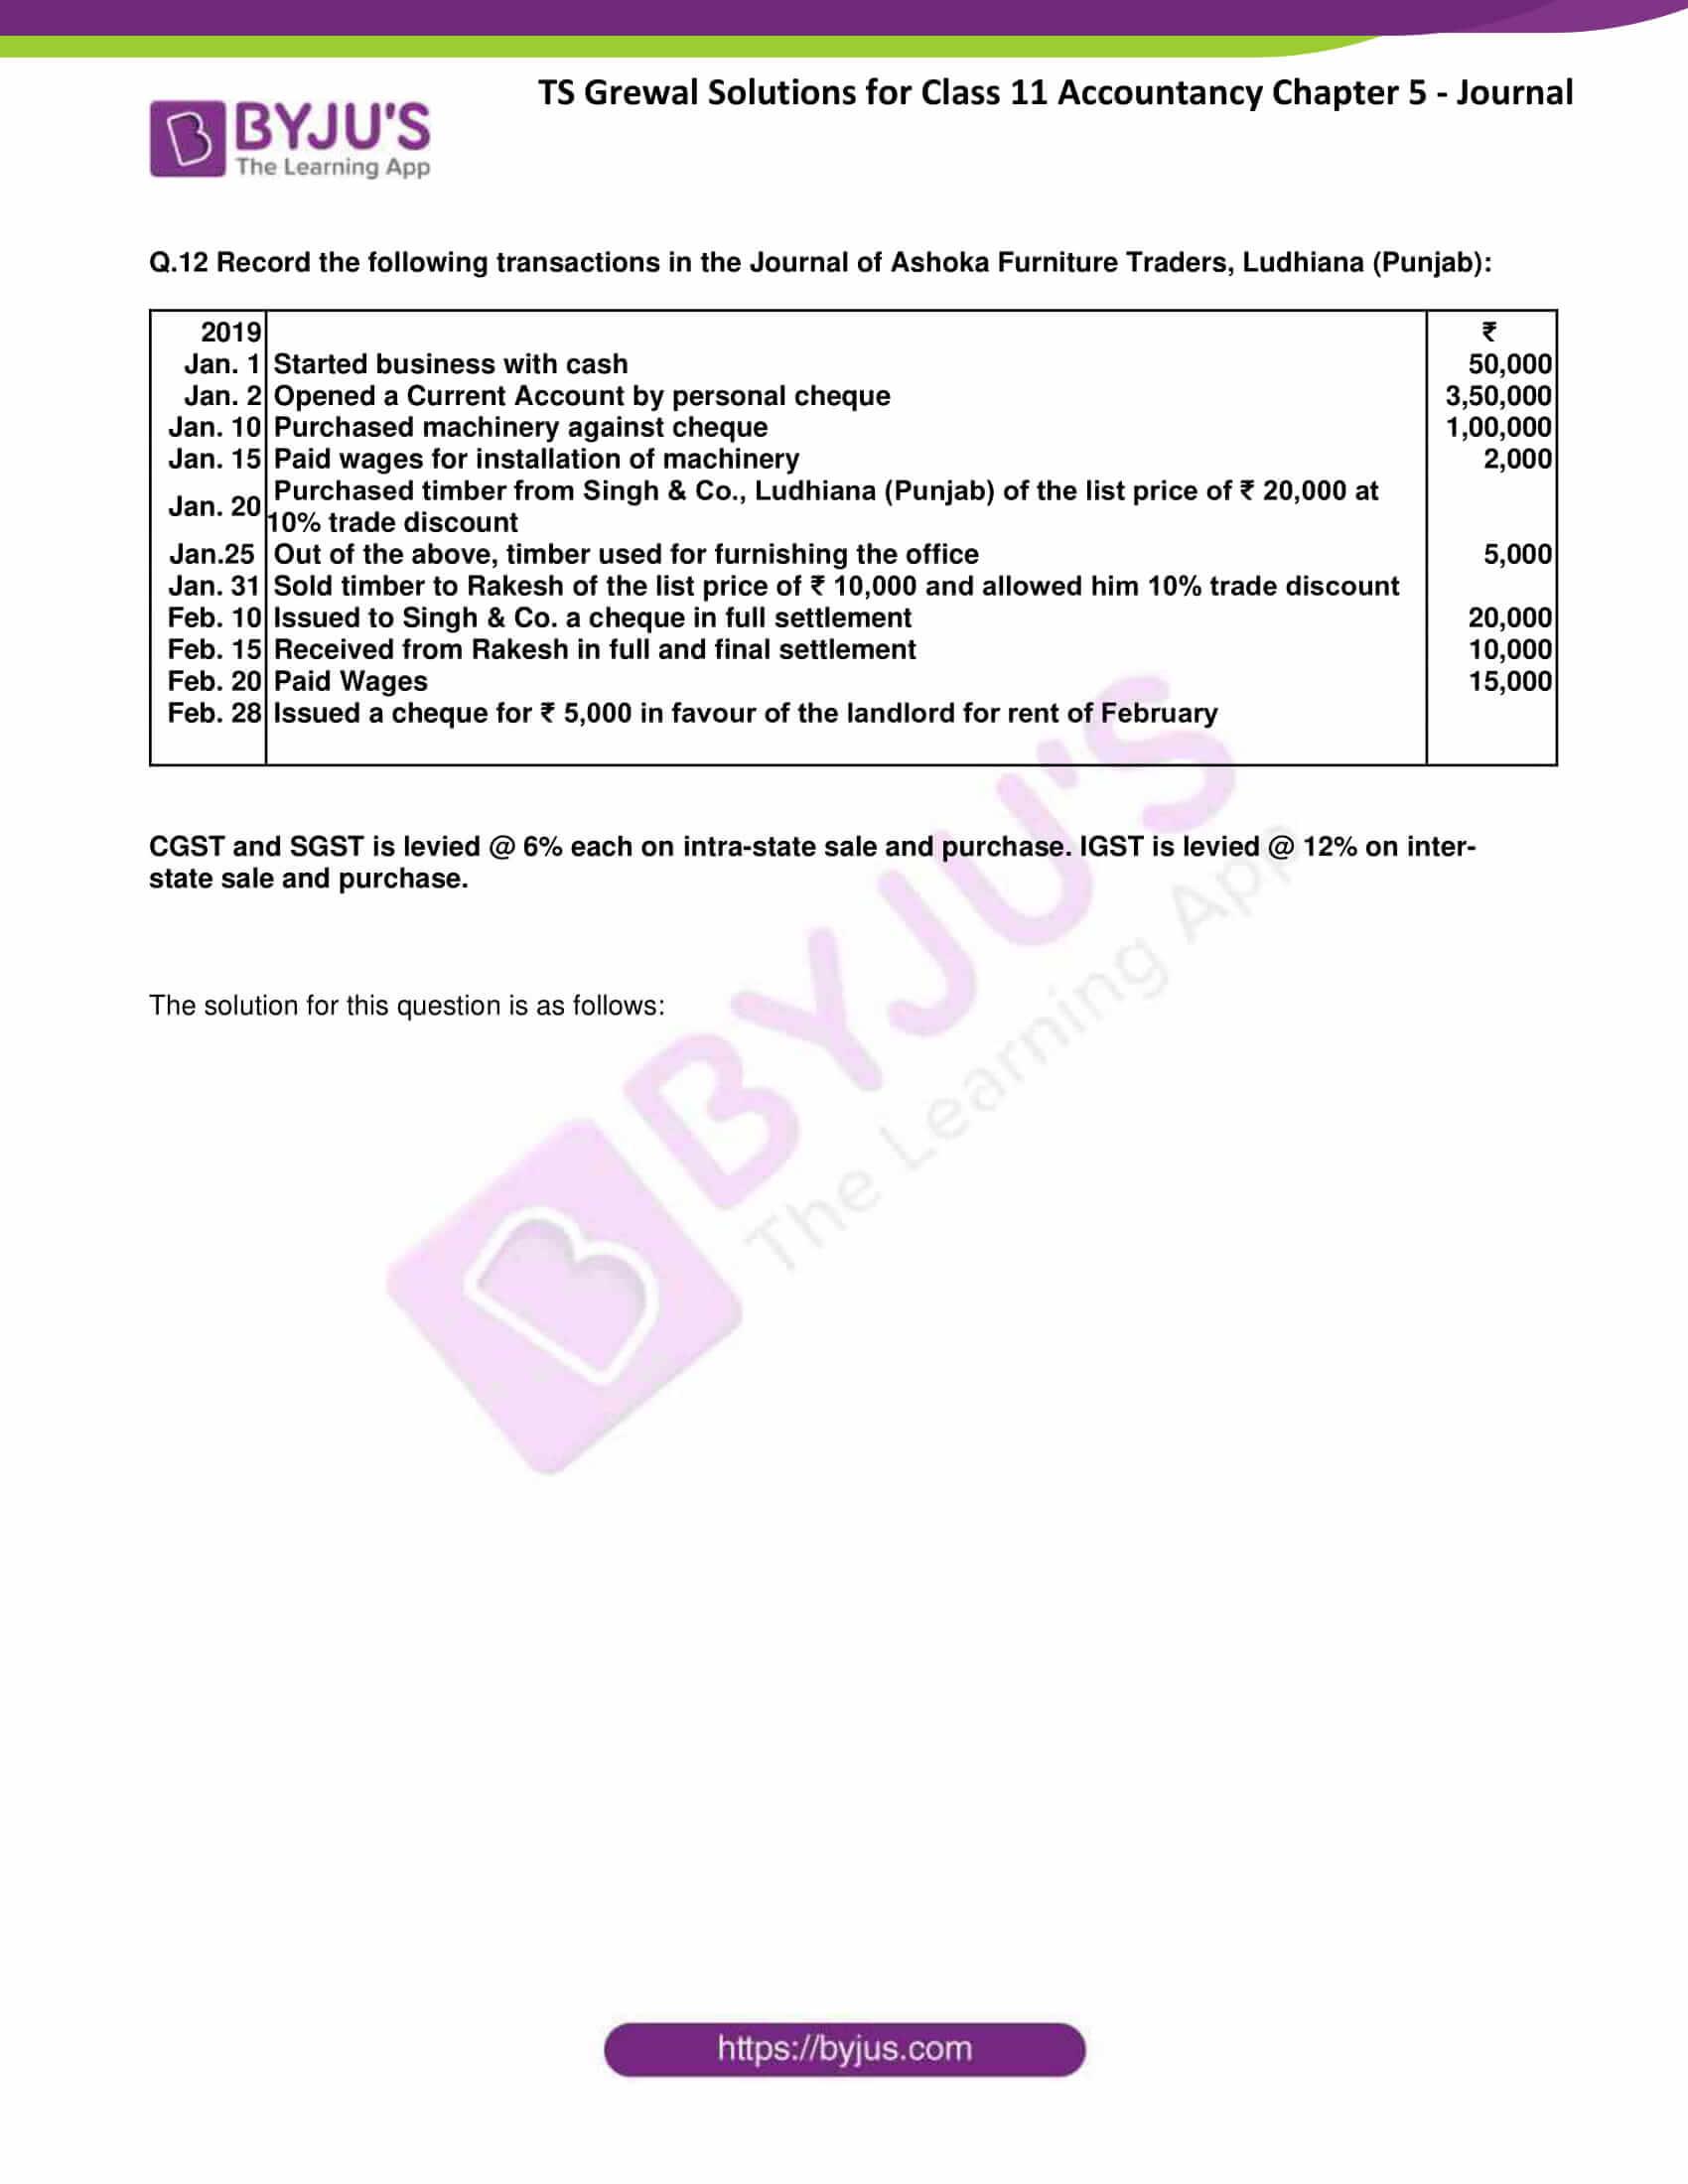 ts grewal class 11 accountancy chapter 5 journal 21